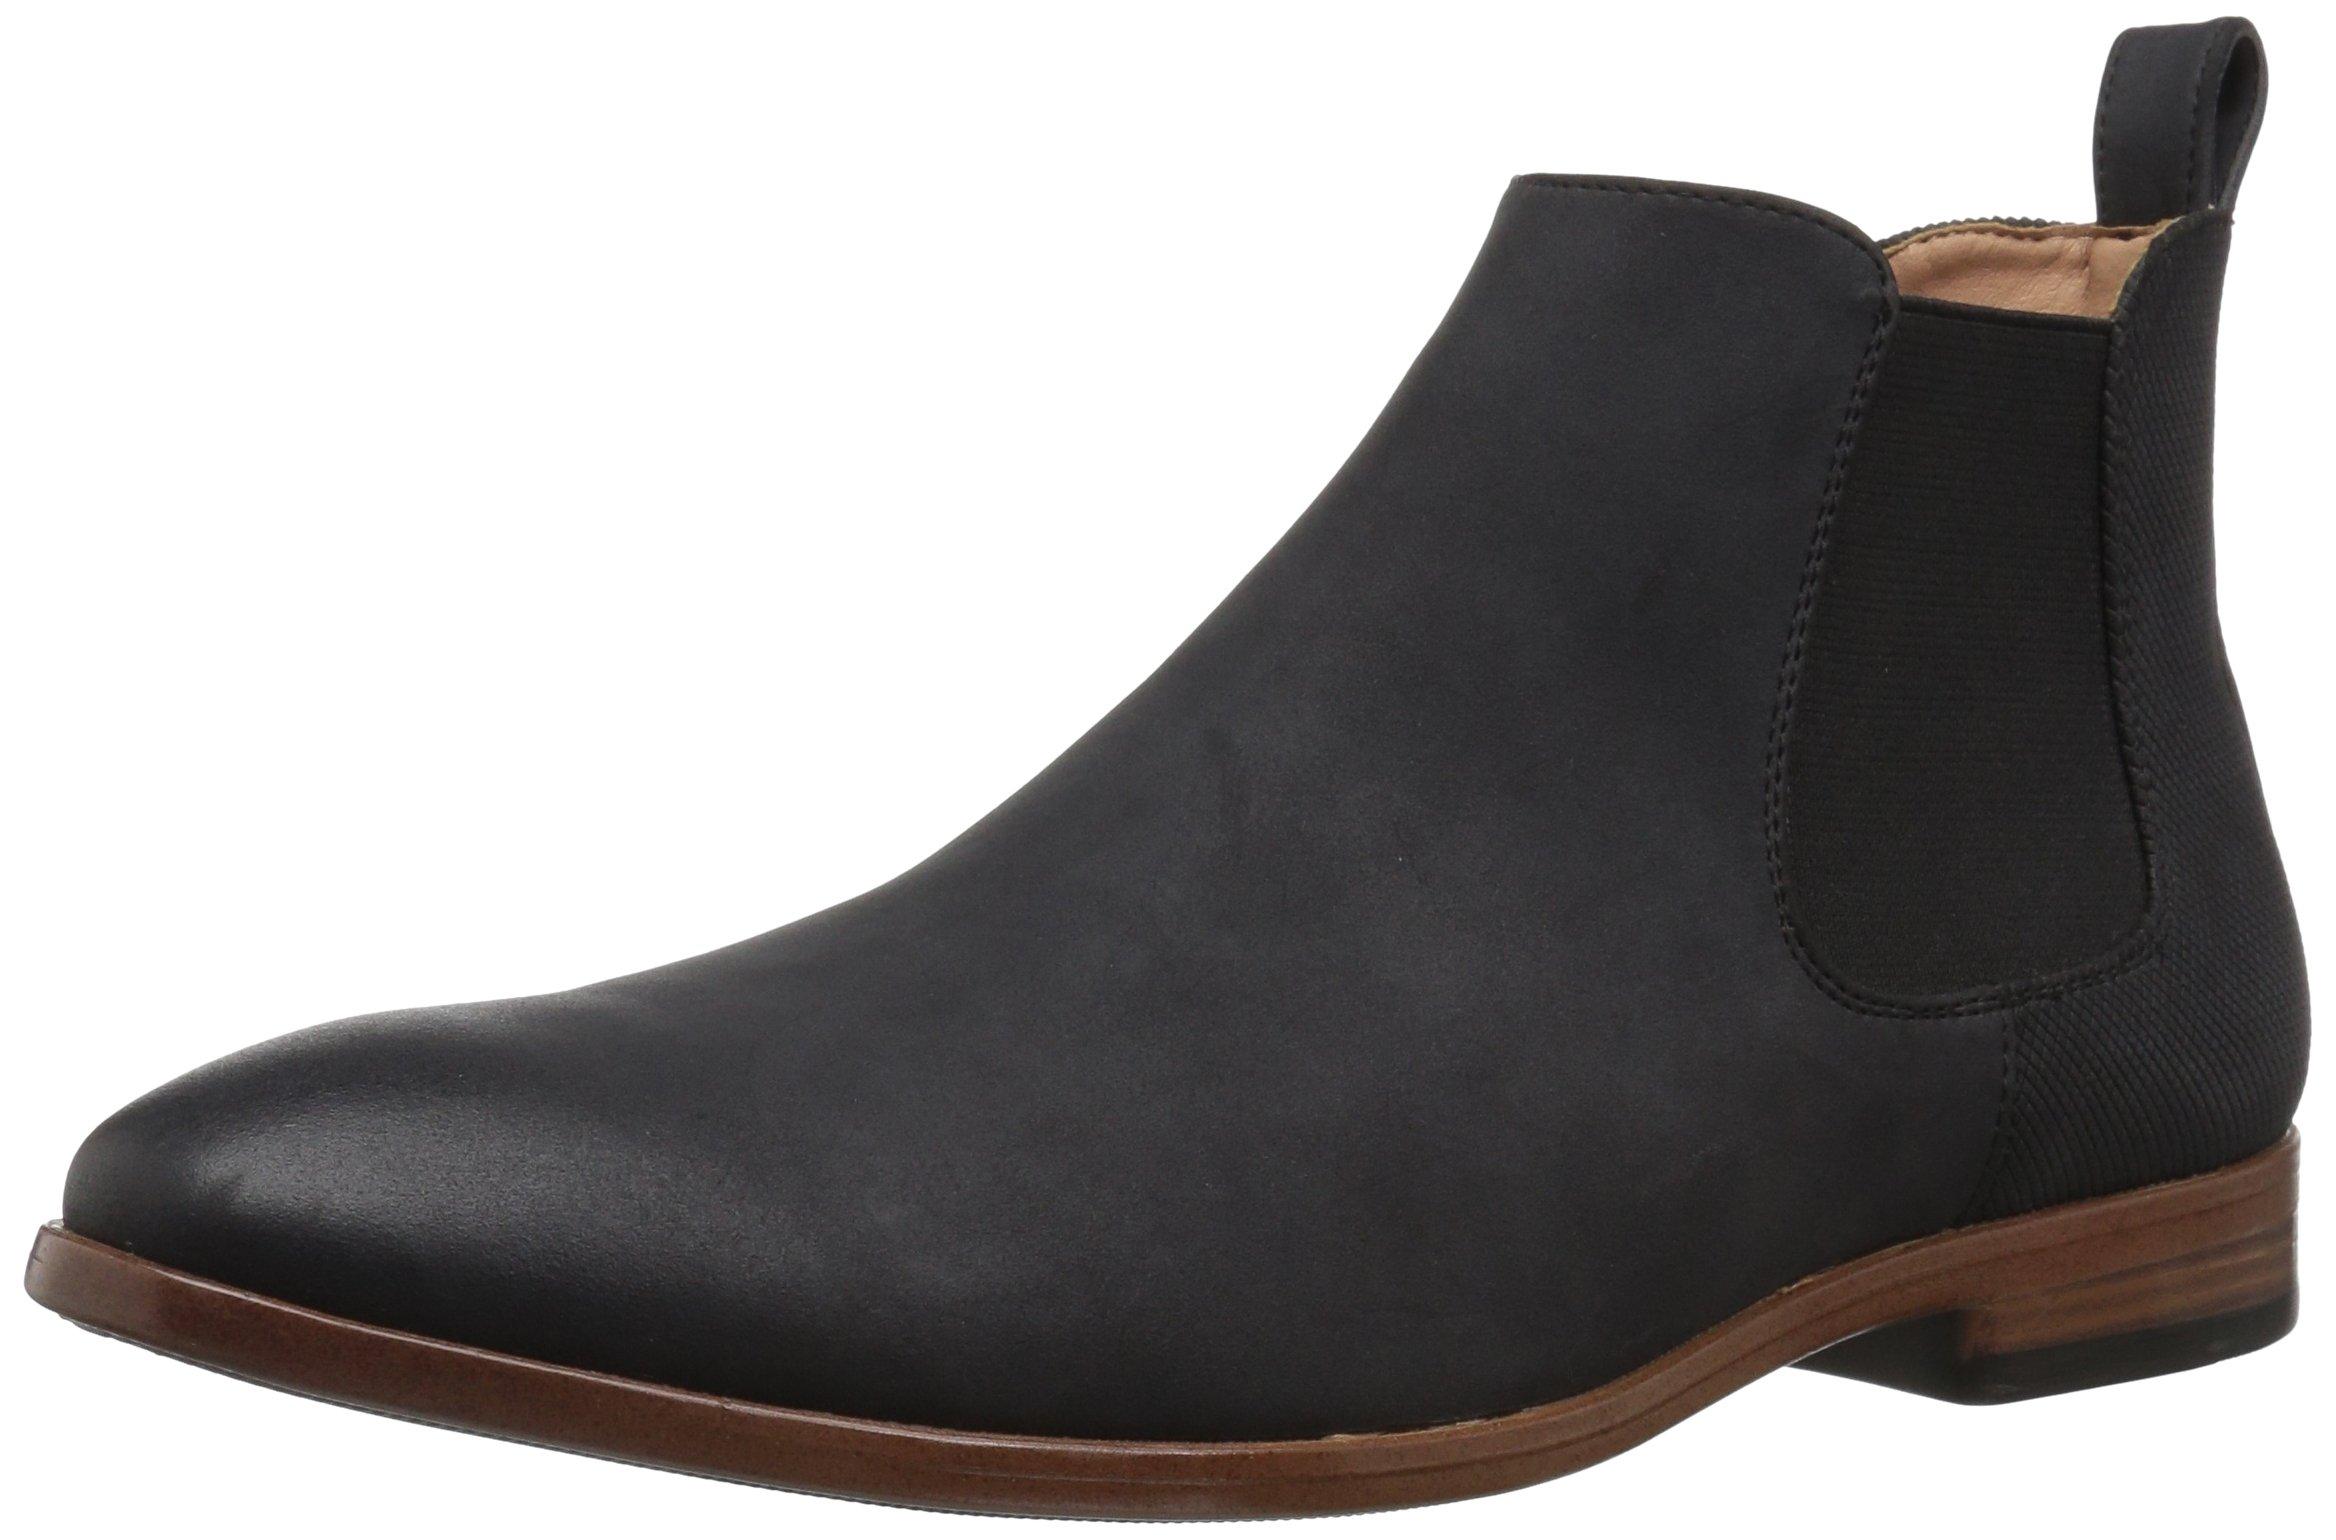 Madden Men's M-Grasp Chelsea Boot, Black Suede, 11 M US